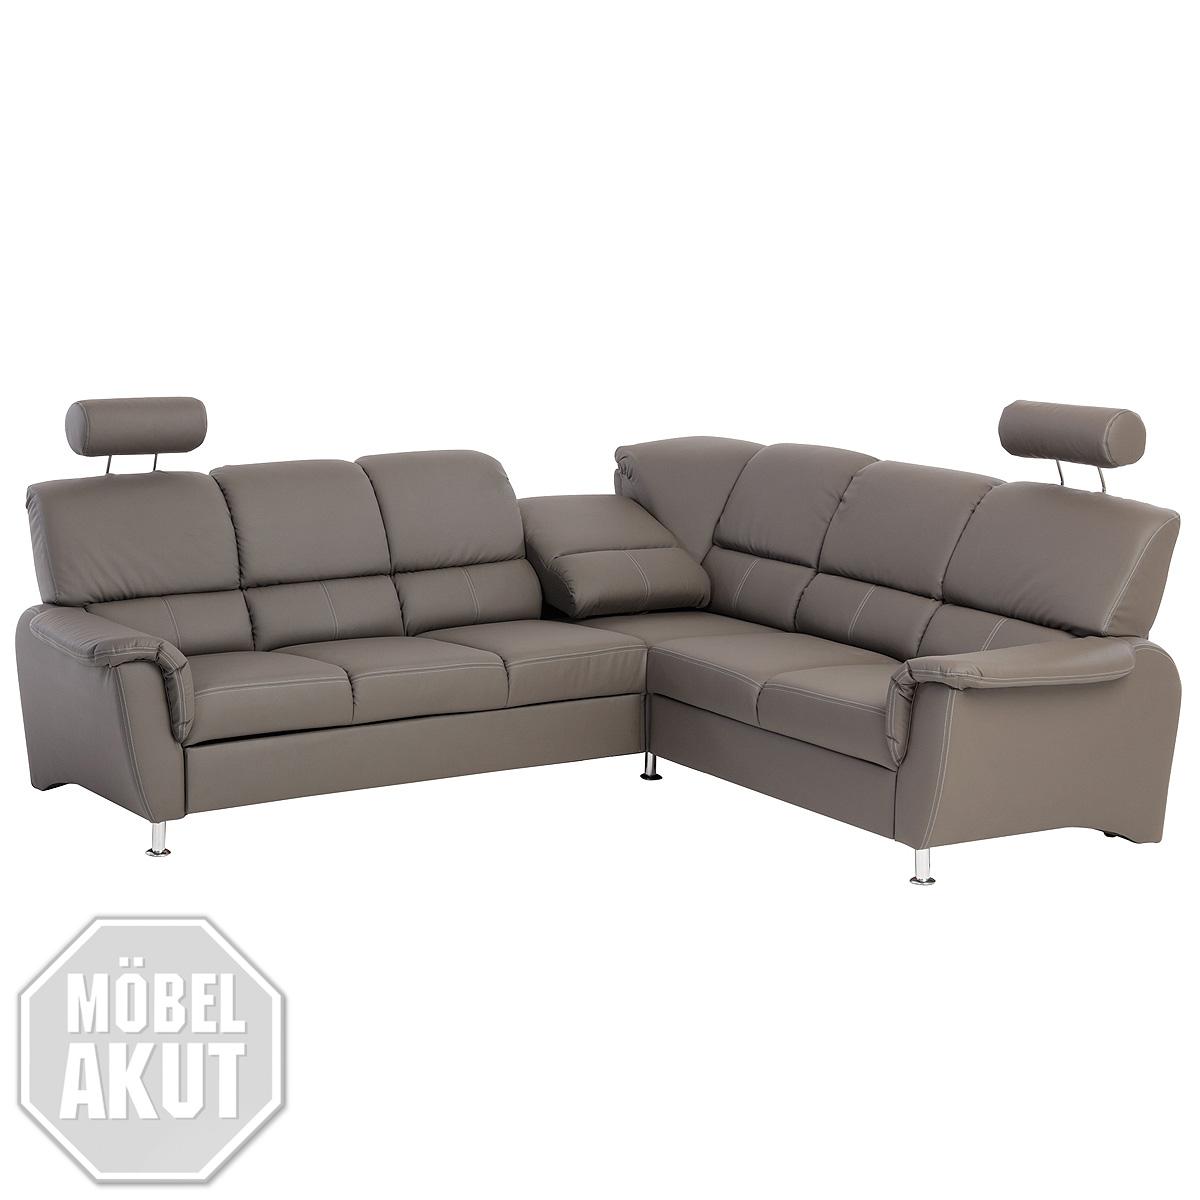 ecksofa pisa eckgarnitur sofa in dunkel grau bettfunktion relaxfunktion ebay. Black Bedroom Furniture Sets. Home Design Ideas